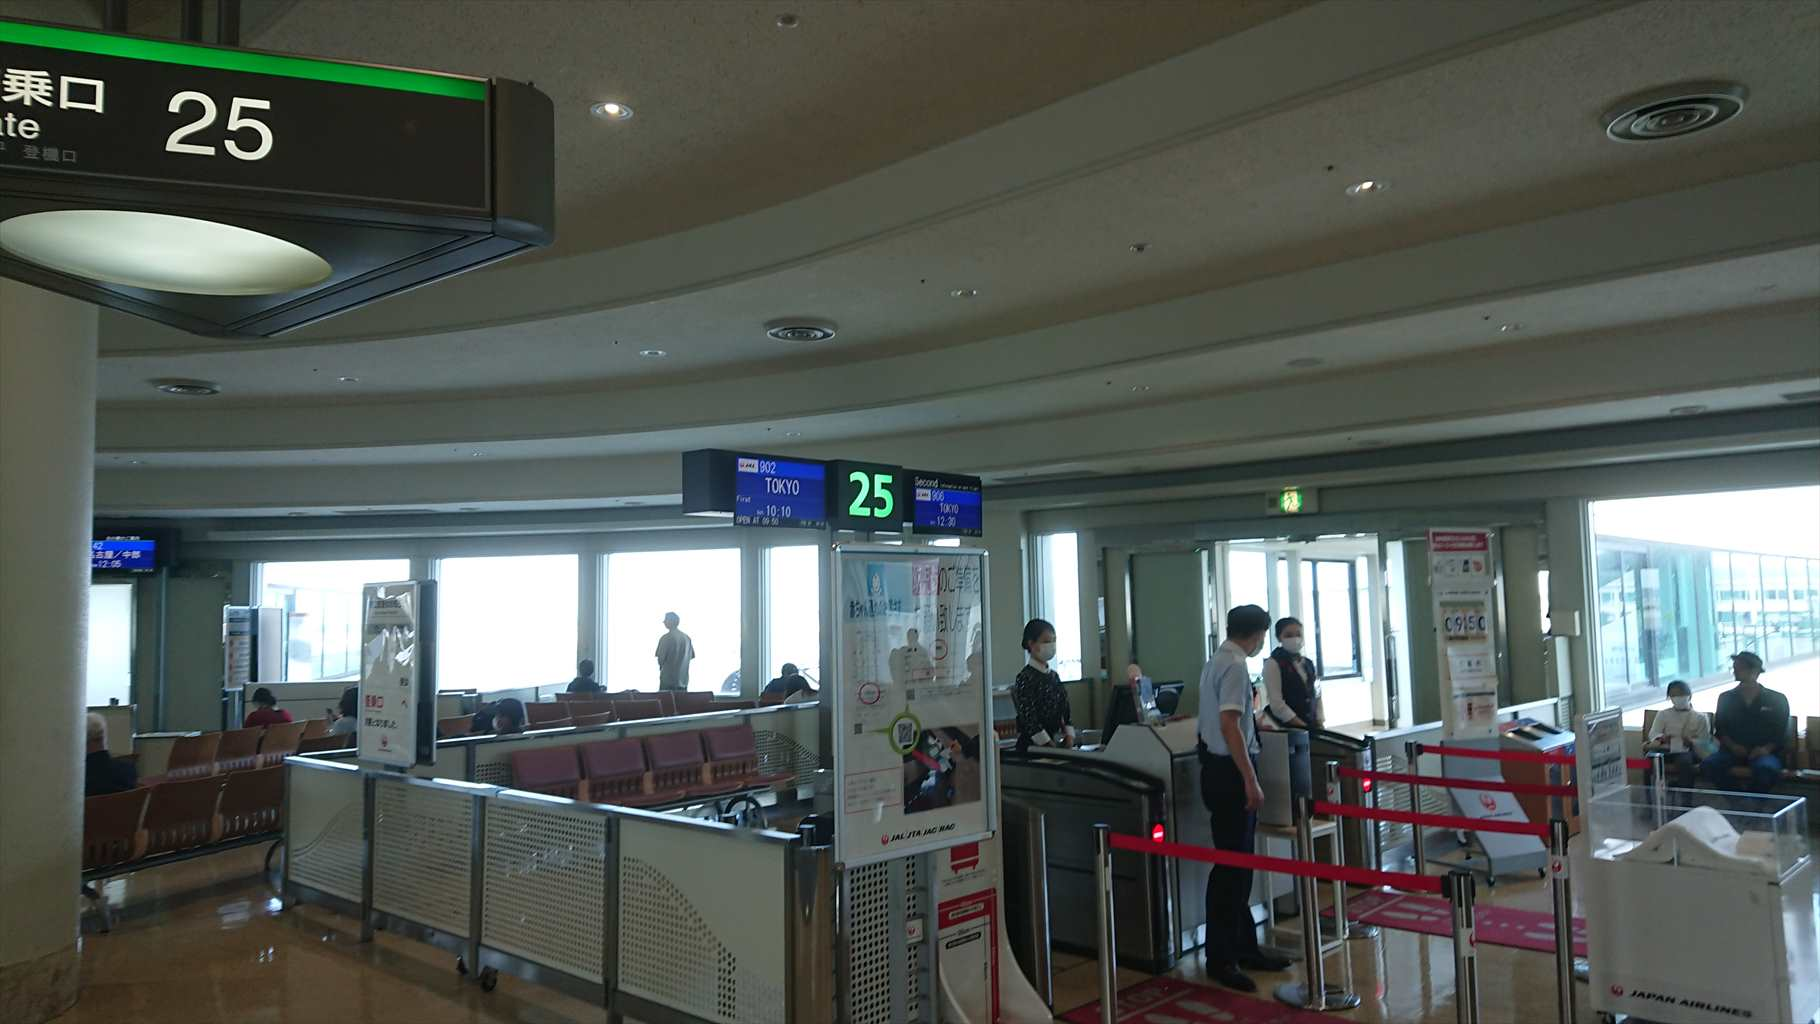 29FEB20 JL902 沖縄 - 羽田 ファーストクラス